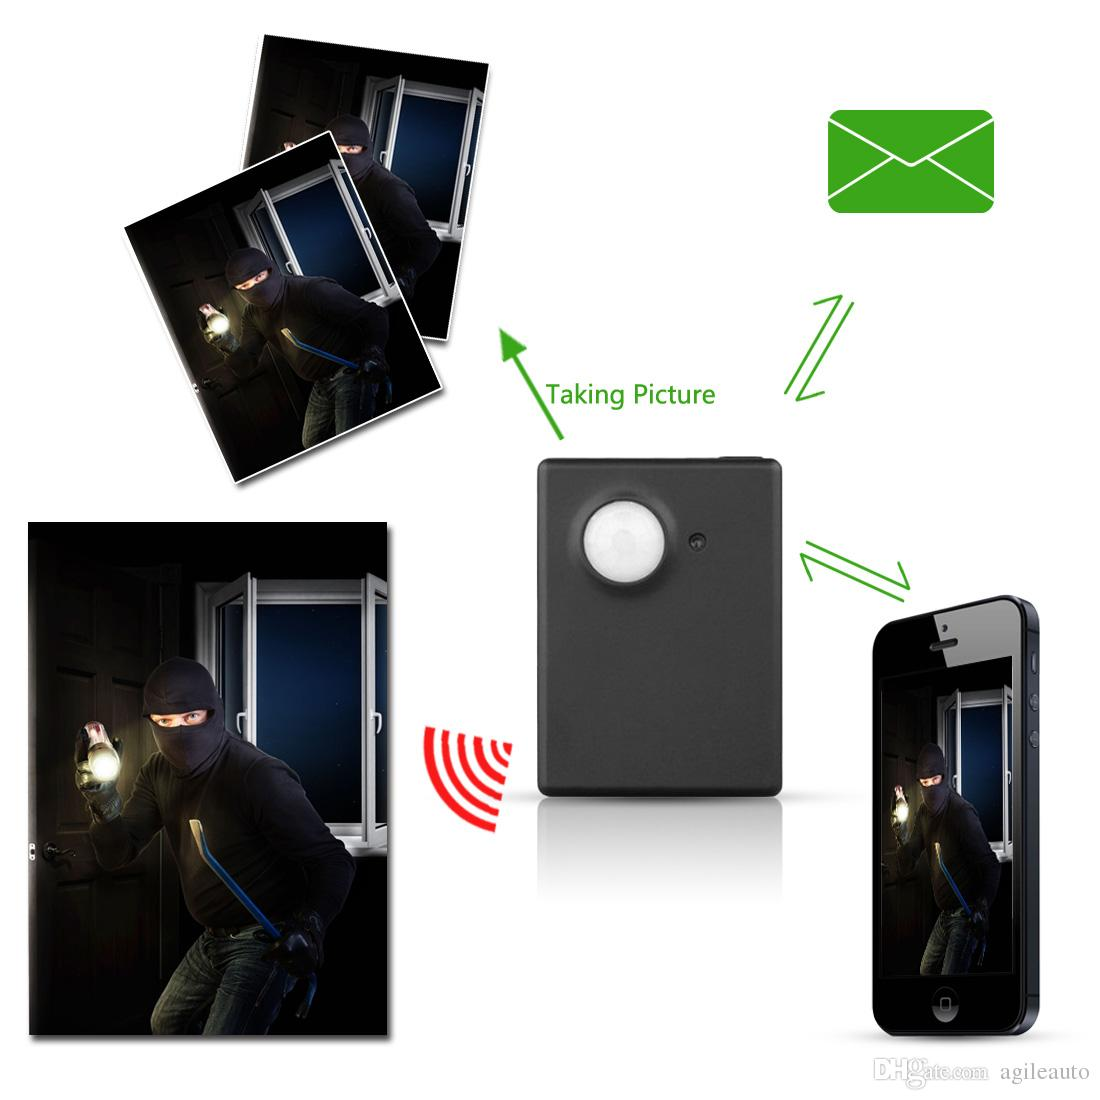 Inalámbrico Mini 1.3M Cámara de infrarrojos Seguridad de video Rastreador GSM Autodial Home Office GPS PIR MMS Sistema de alarma GPS_622